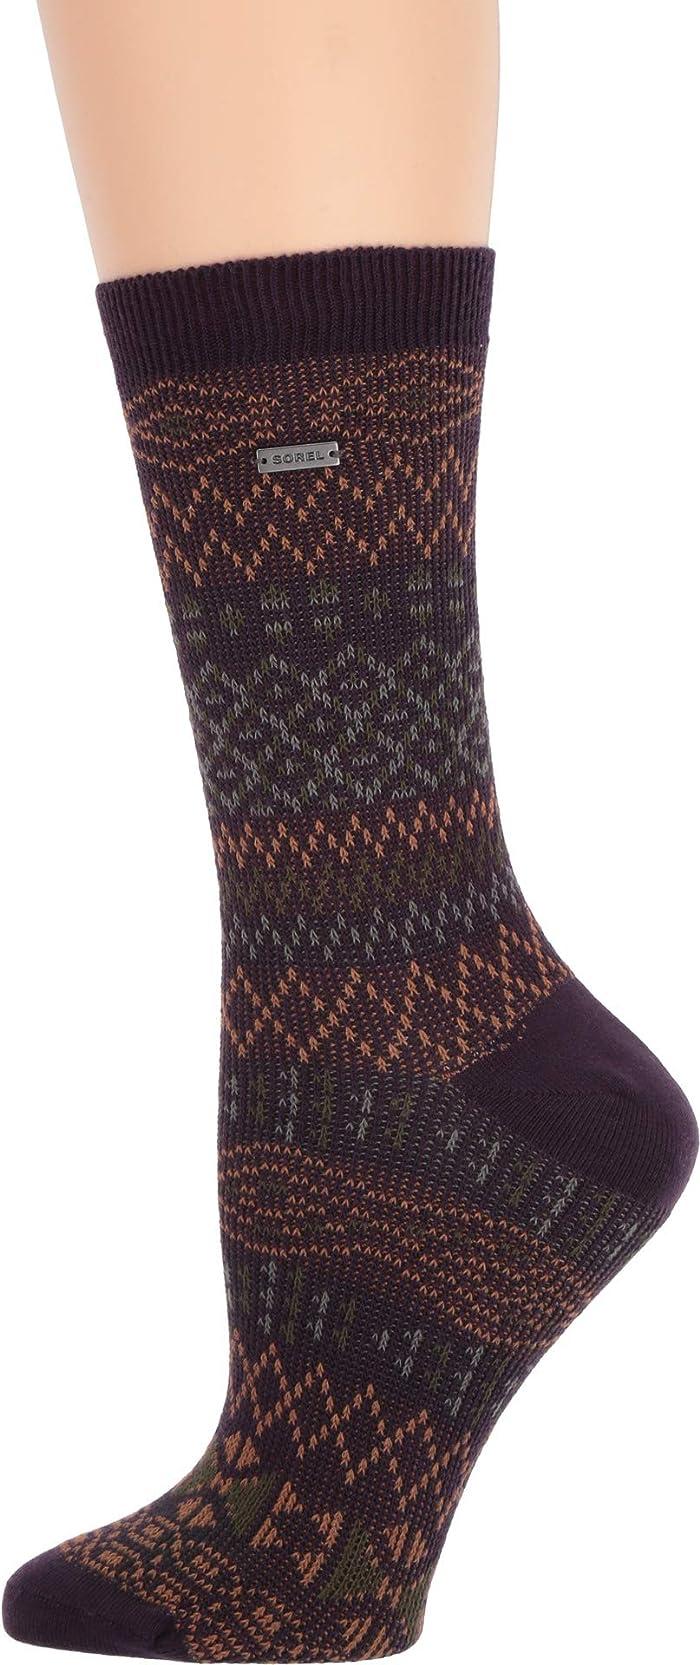 UPC 023616485597 product image for SOREL Cotton Jacquard Pattern Crew (Dark Plum) Women's Crew Cut Socks Shoes   upcitemdb.com